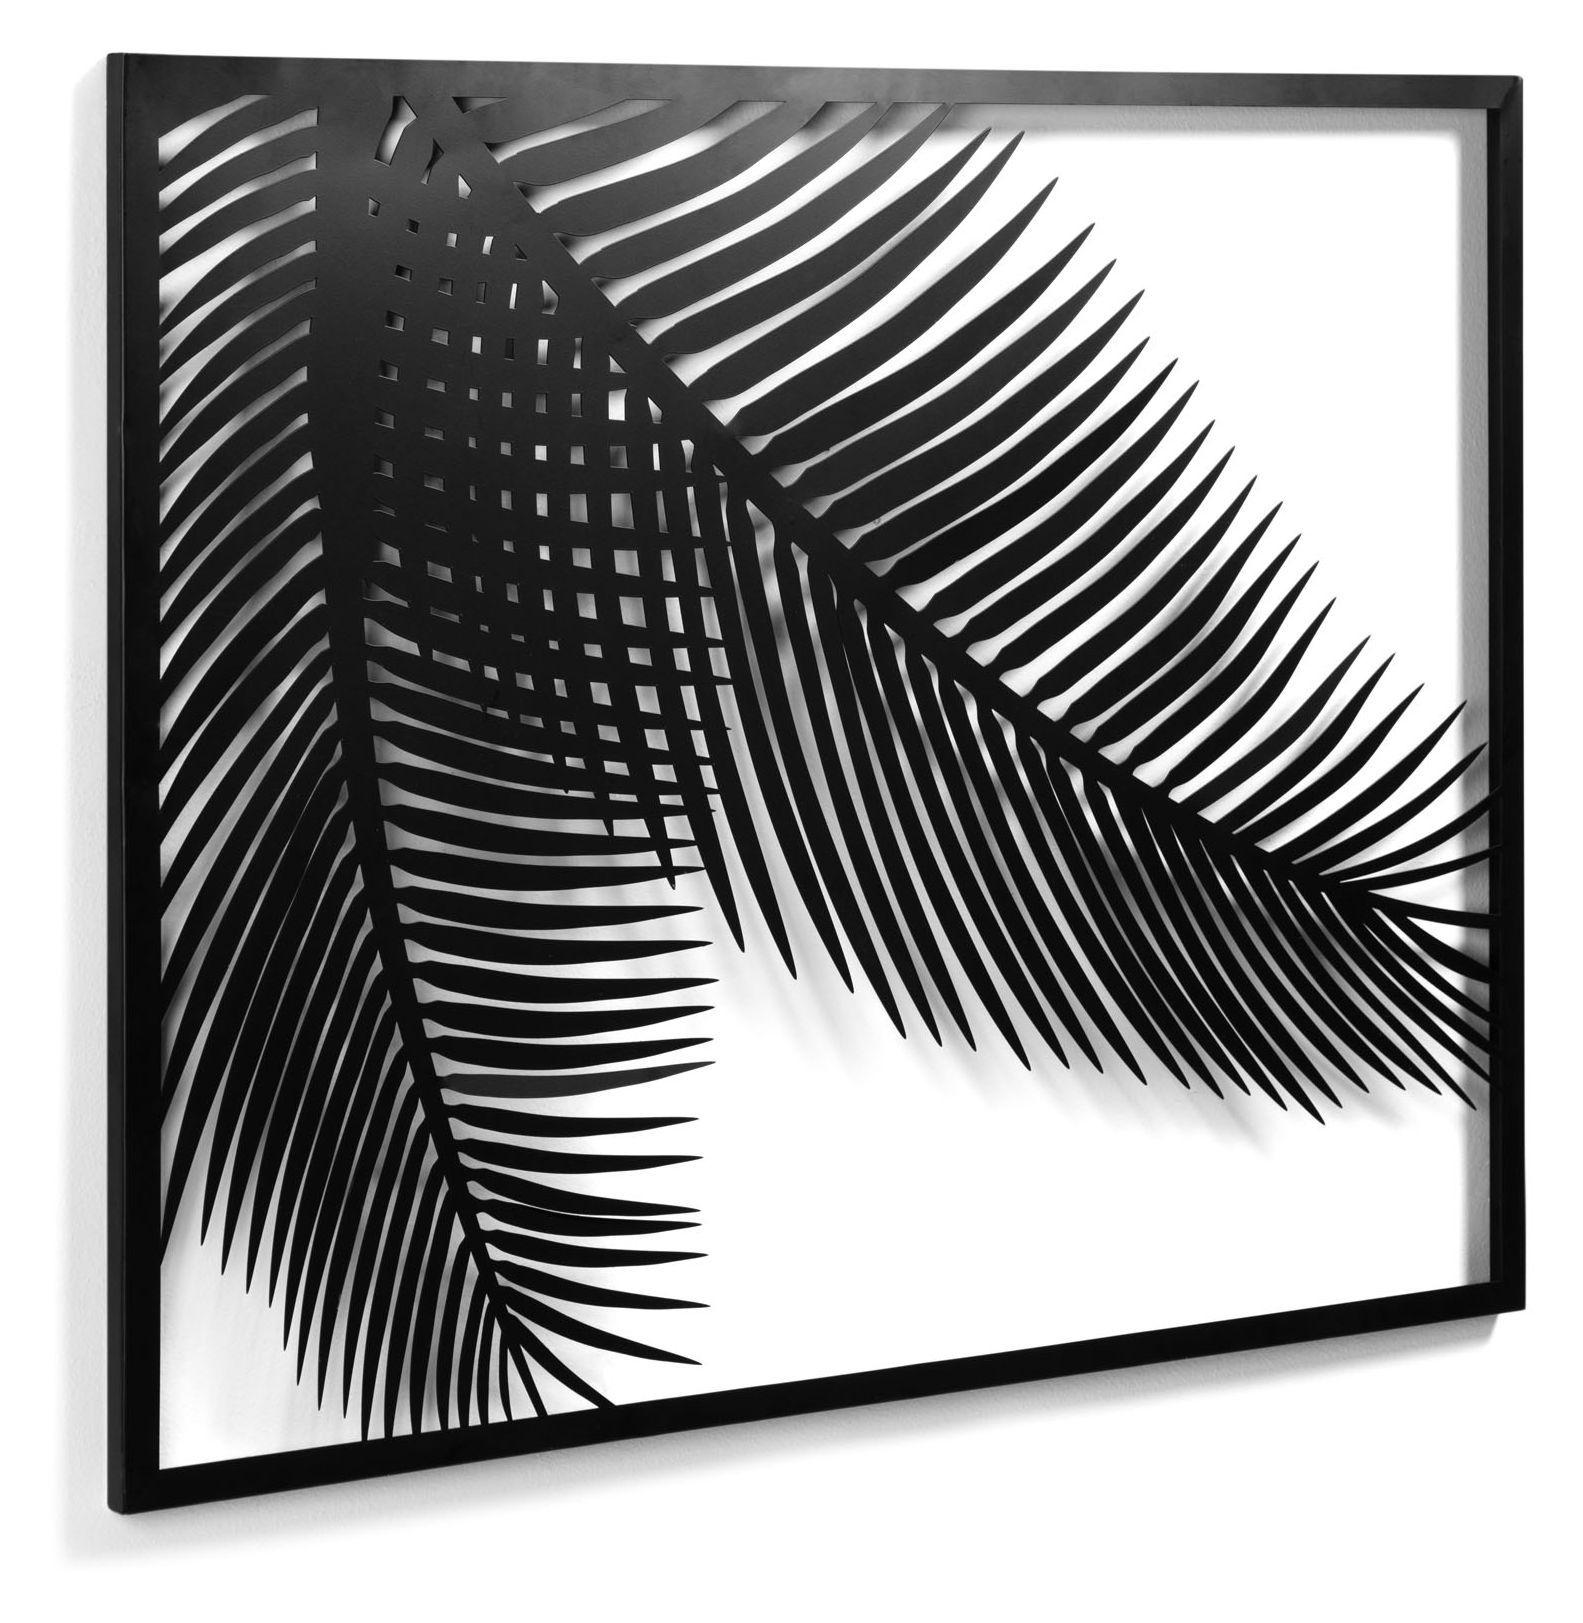 LaForma Dimpia Væg Dekoration - Sort